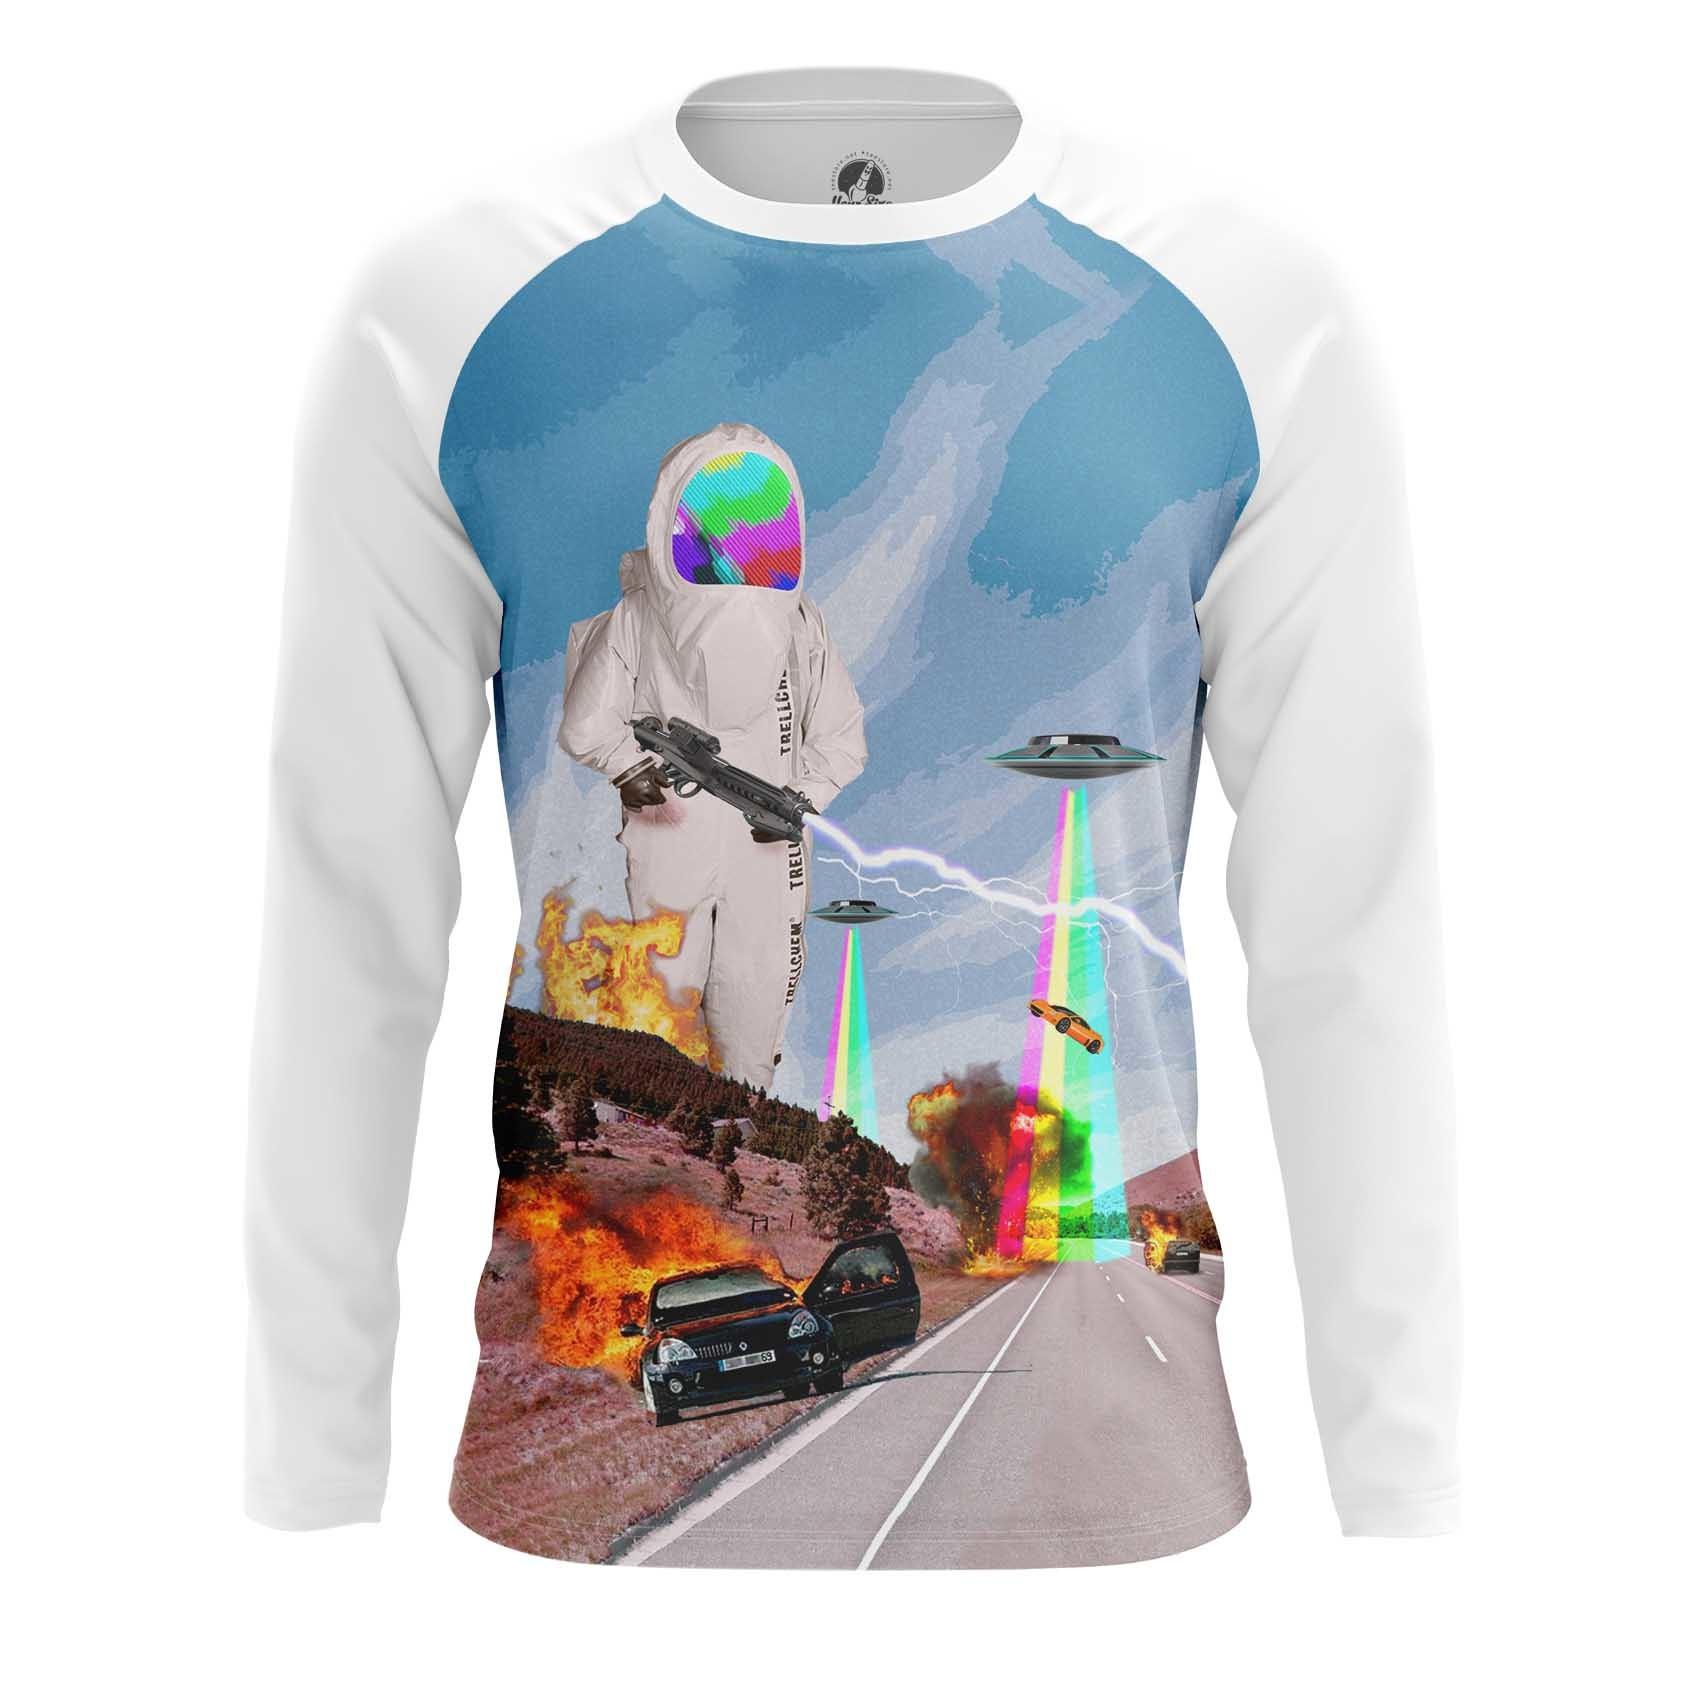 Merchandise Men'S T-Shirt Biohazard Internet Costumes Rainbow